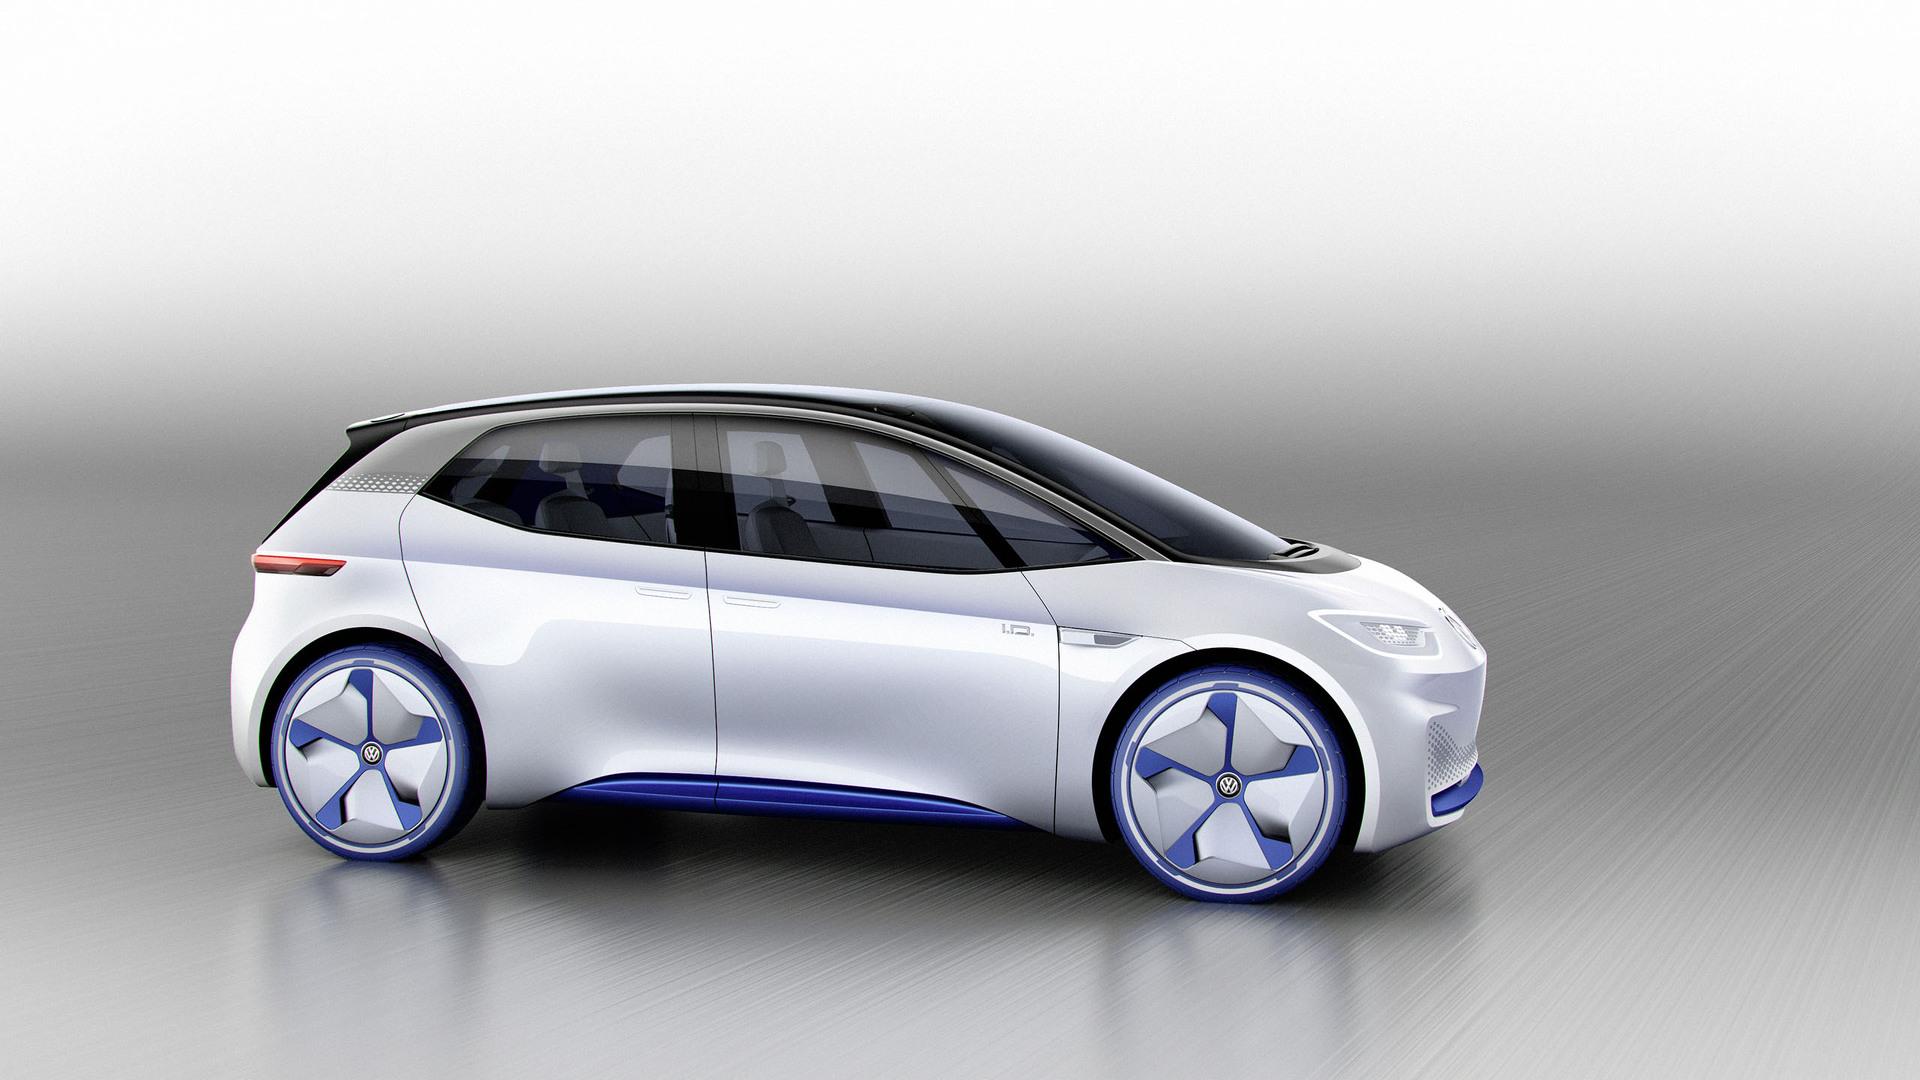 vw pode compartilhar plataforma meb de carros elétricos